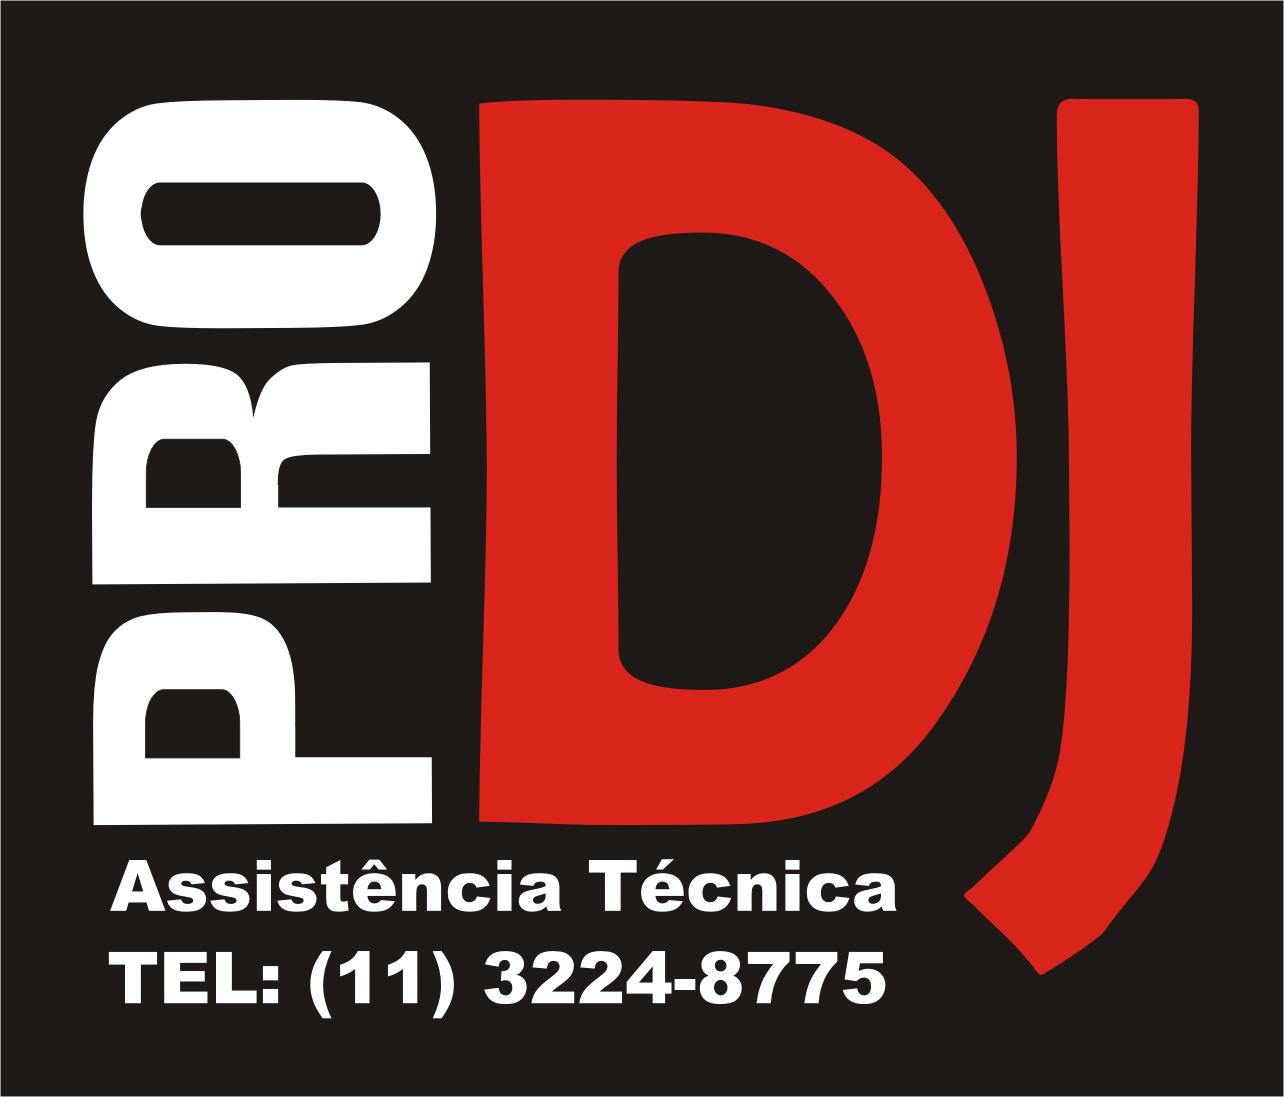 ProDj Assistência Técnica